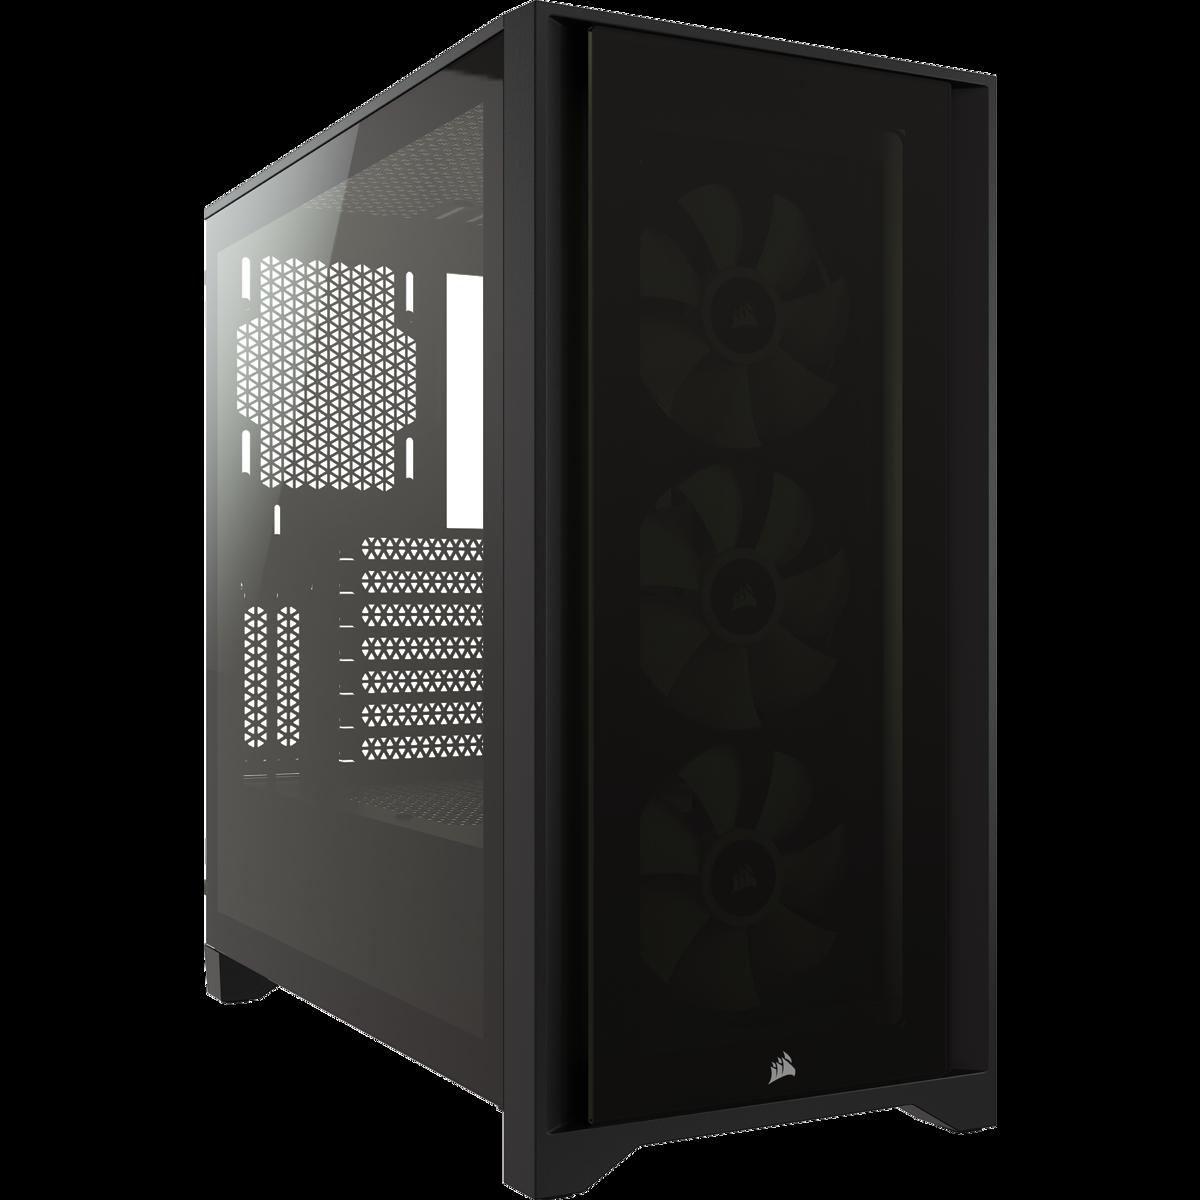 ICUE 4000X BLACK +3 FAN RGB - CORSAIR